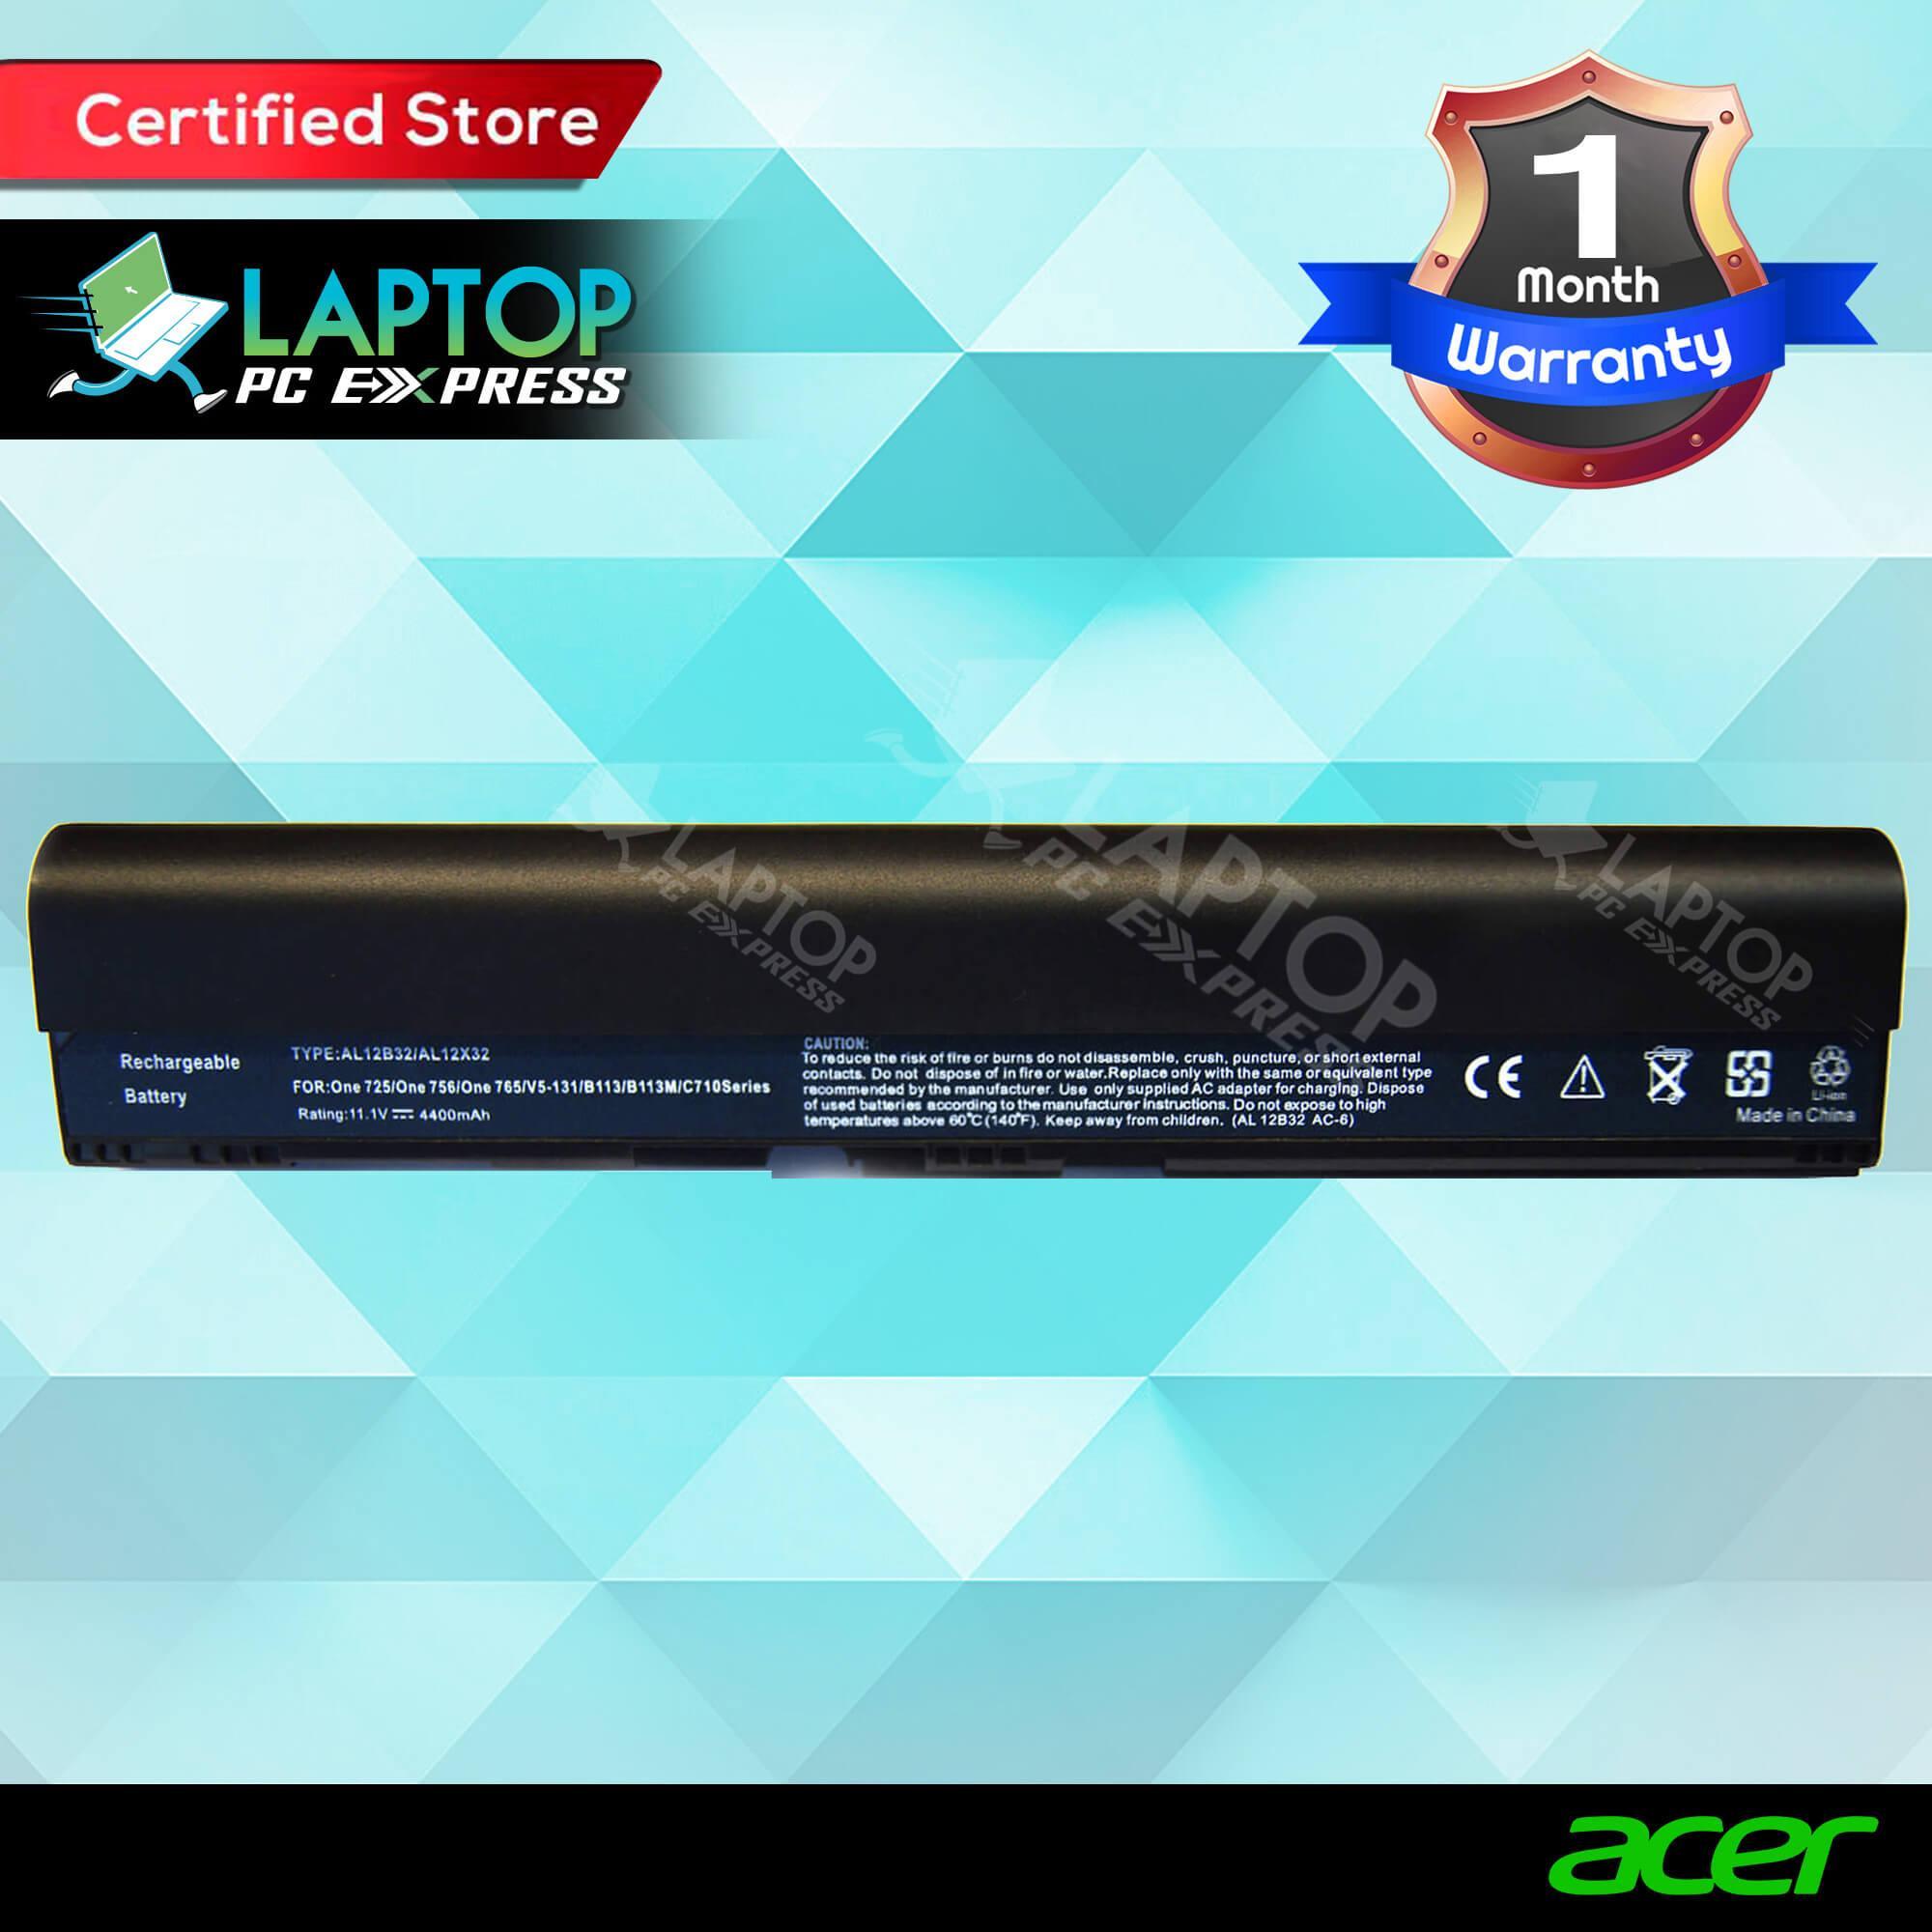 Acer Philippines Computer Batteries For Sale Prices Baterai Laptop Aspire V5 431 431g 471 471g 531 Battery Al12b31 Al12b32 Al12b72 Al12a31 Al12x32 756 171 B113 B113m C7 C710